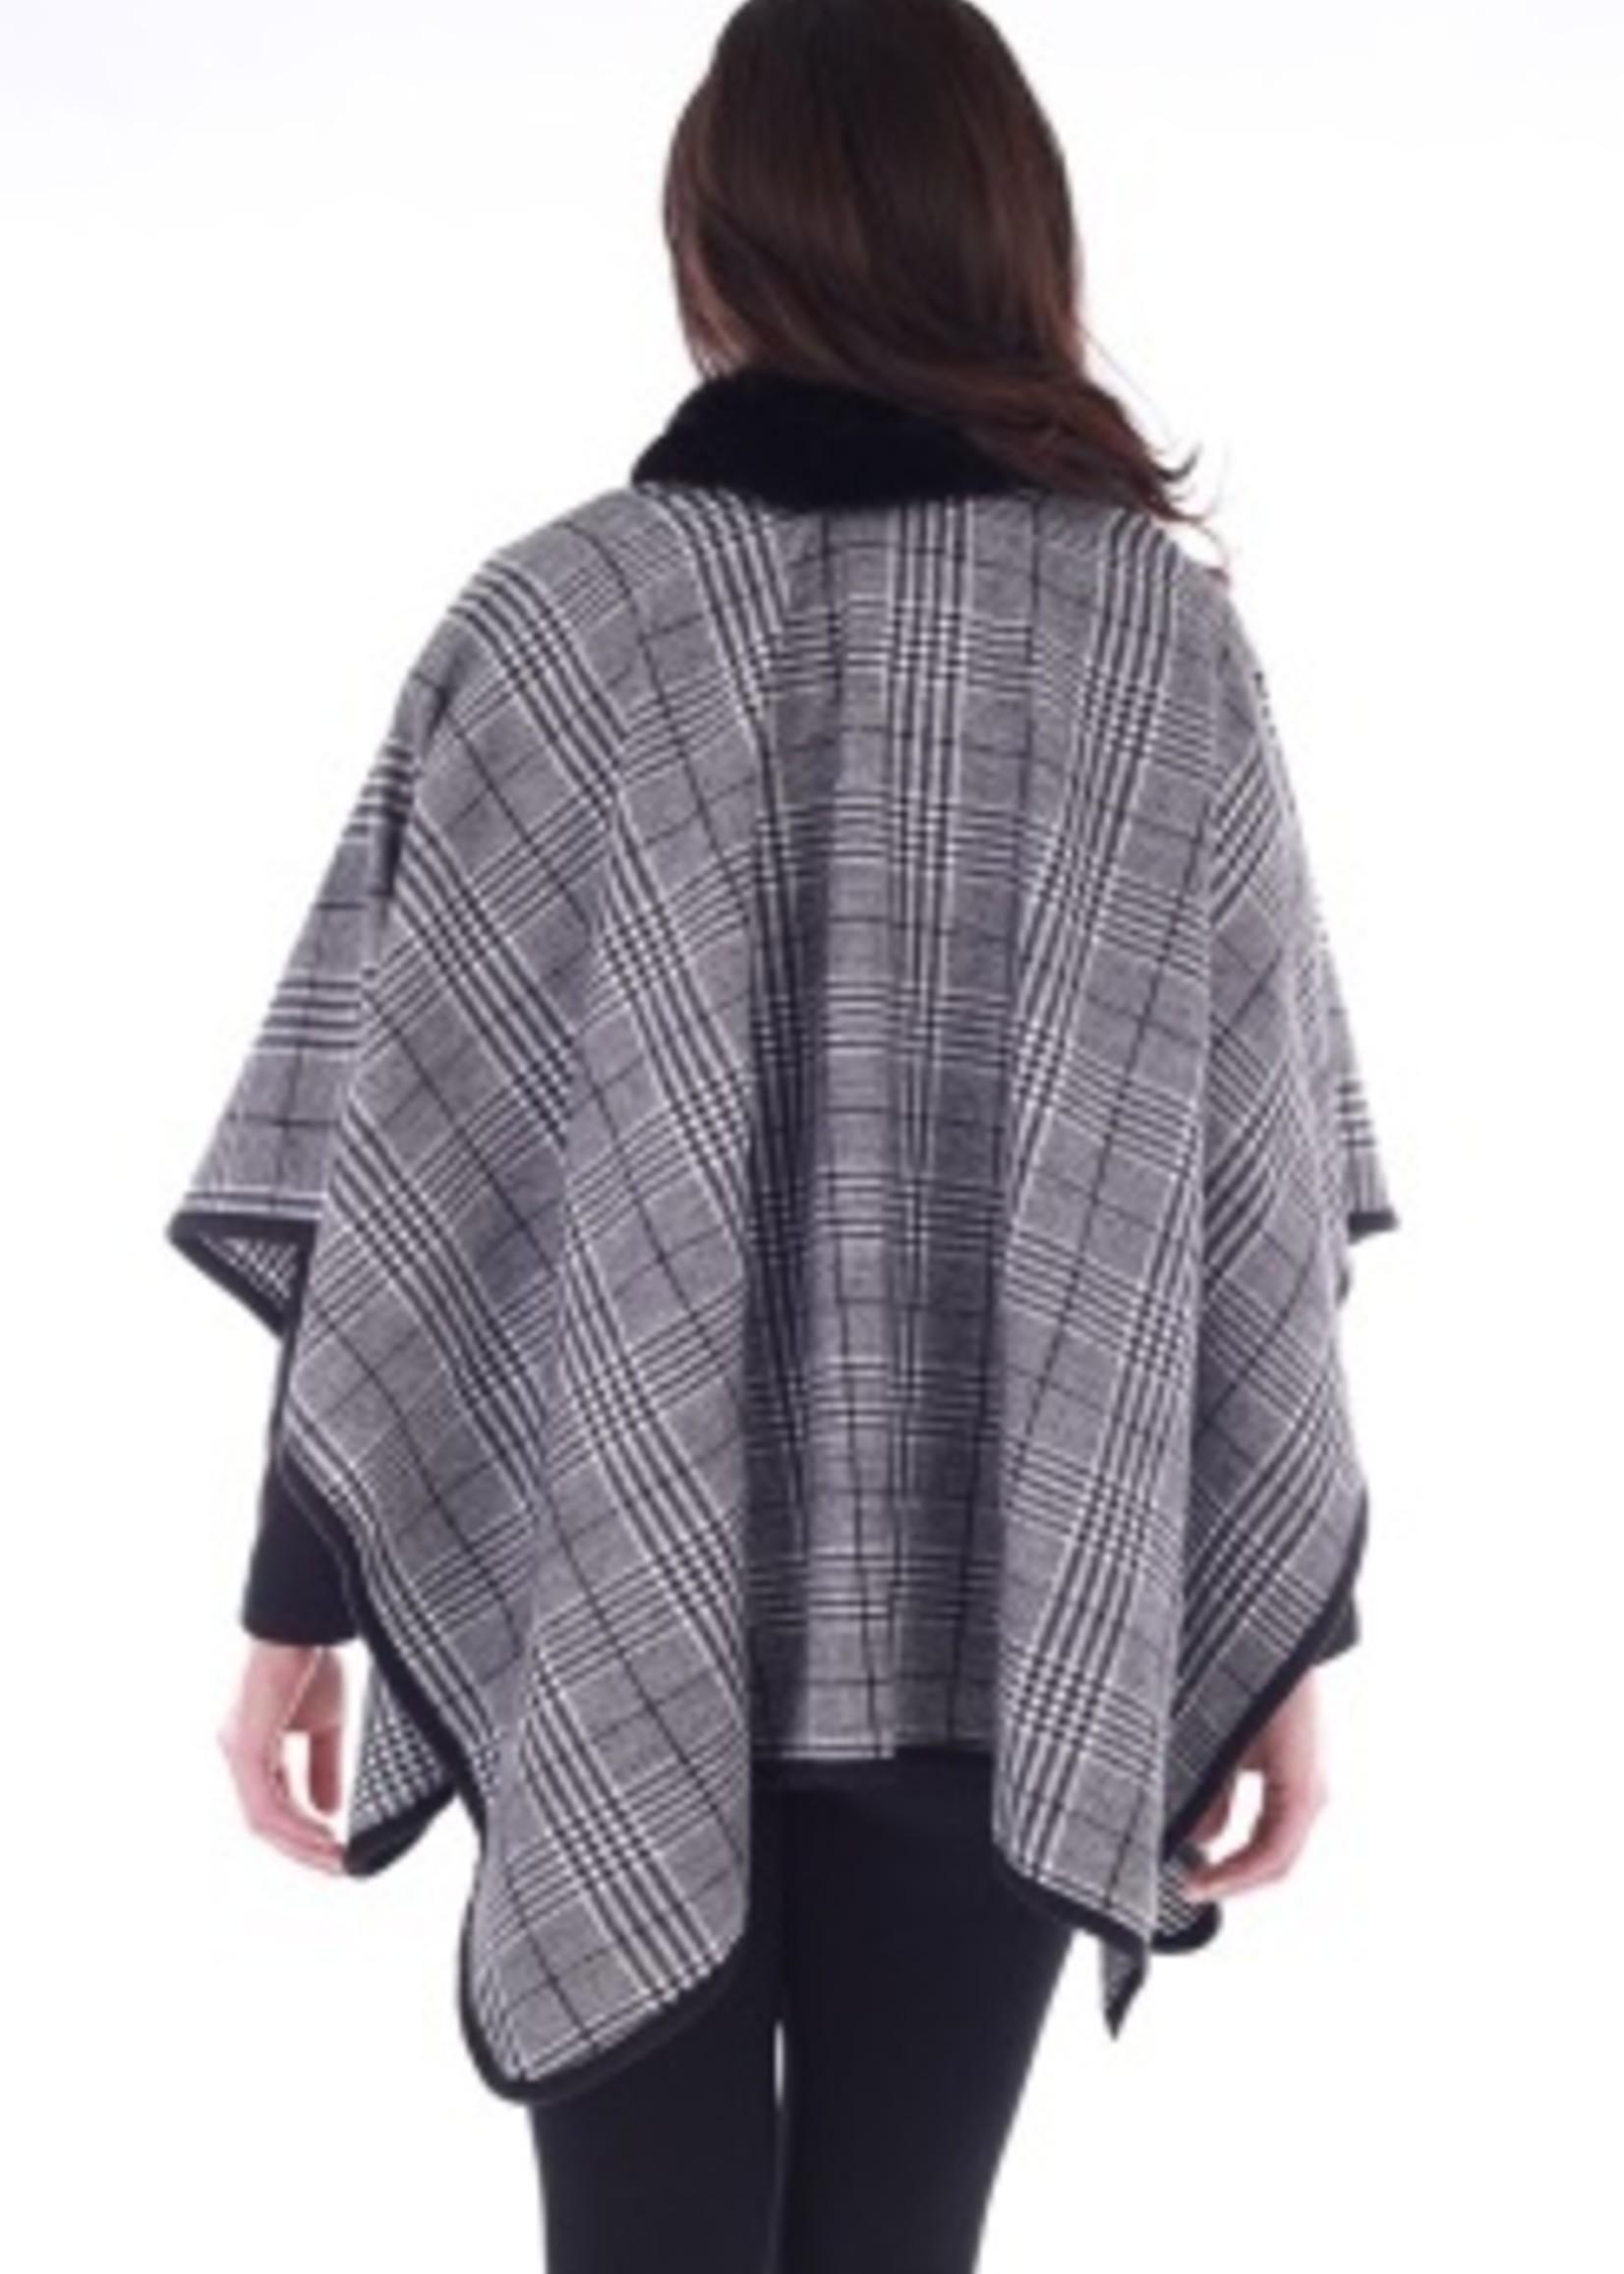 Donna White Plaid Cape with Fur Collar